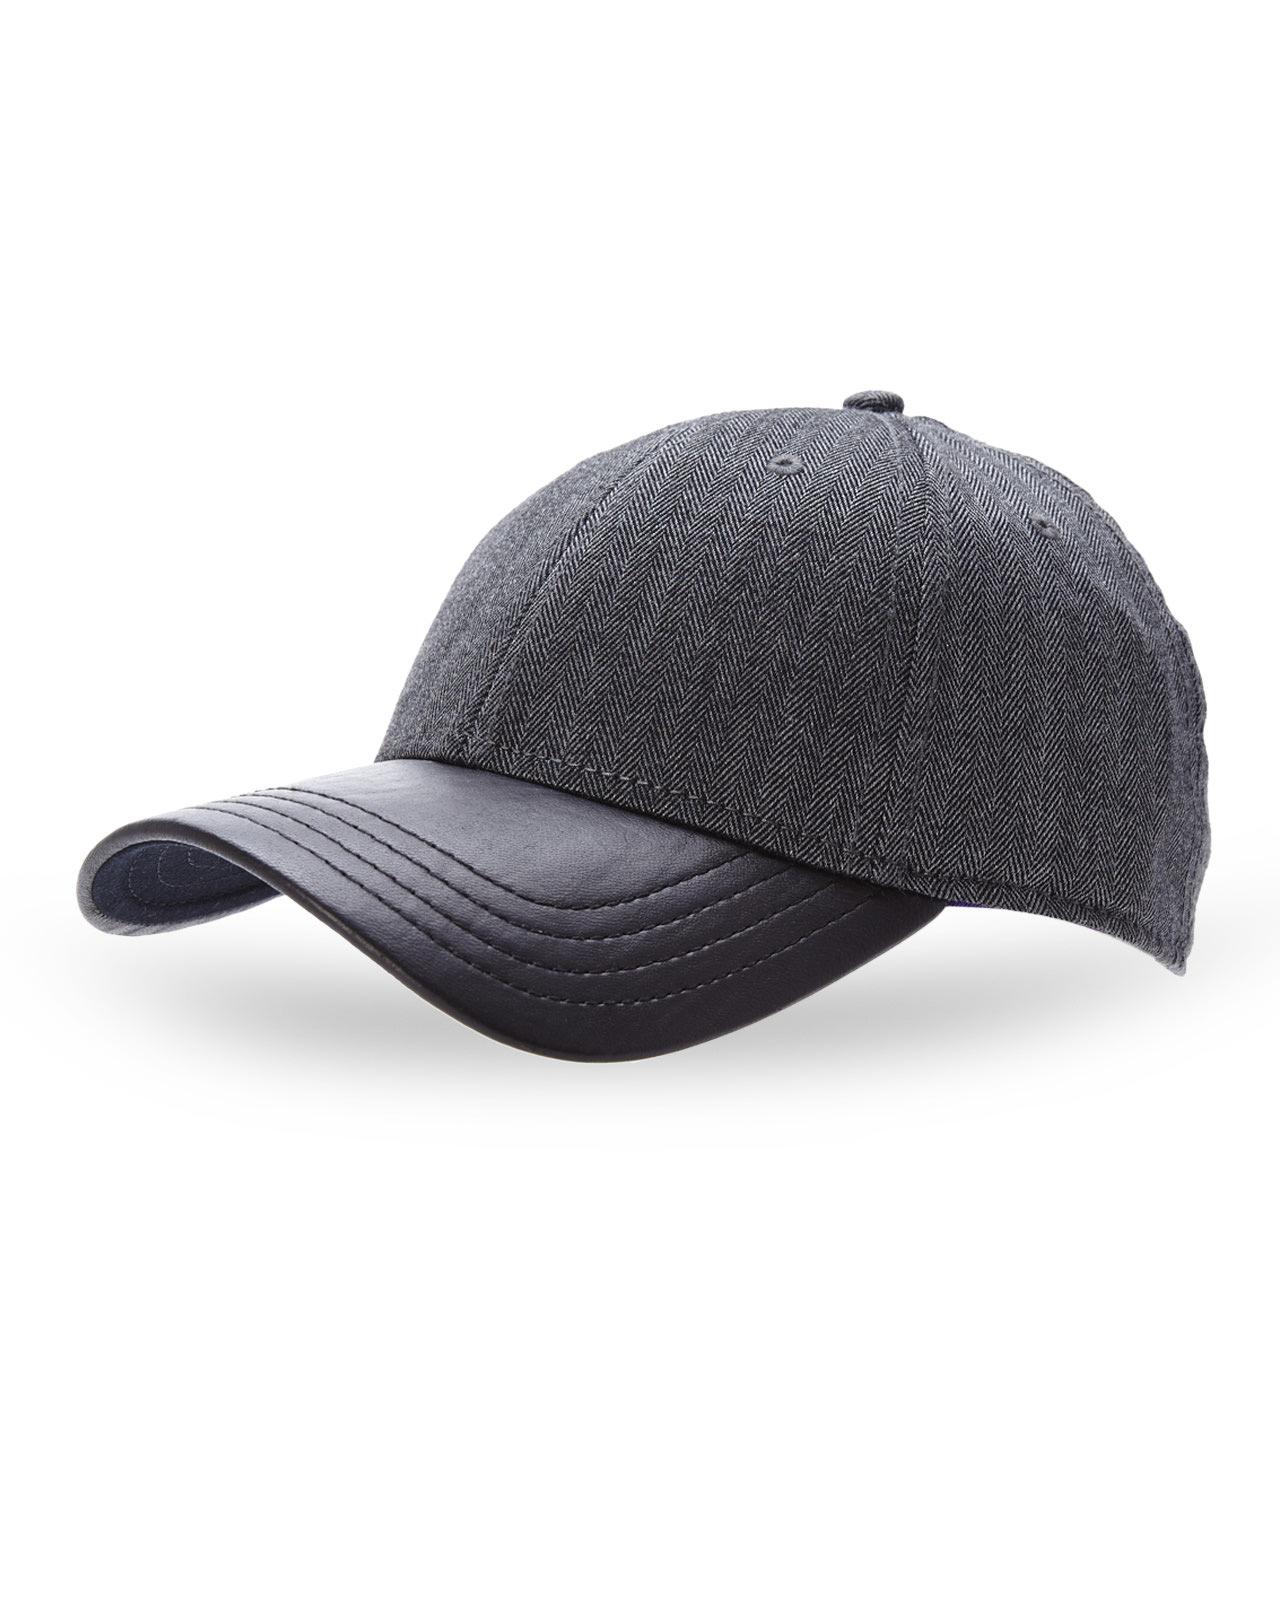 Lyst Gents Herringbone Mixed Media Baseball Cap in Gray 907b0b01571a